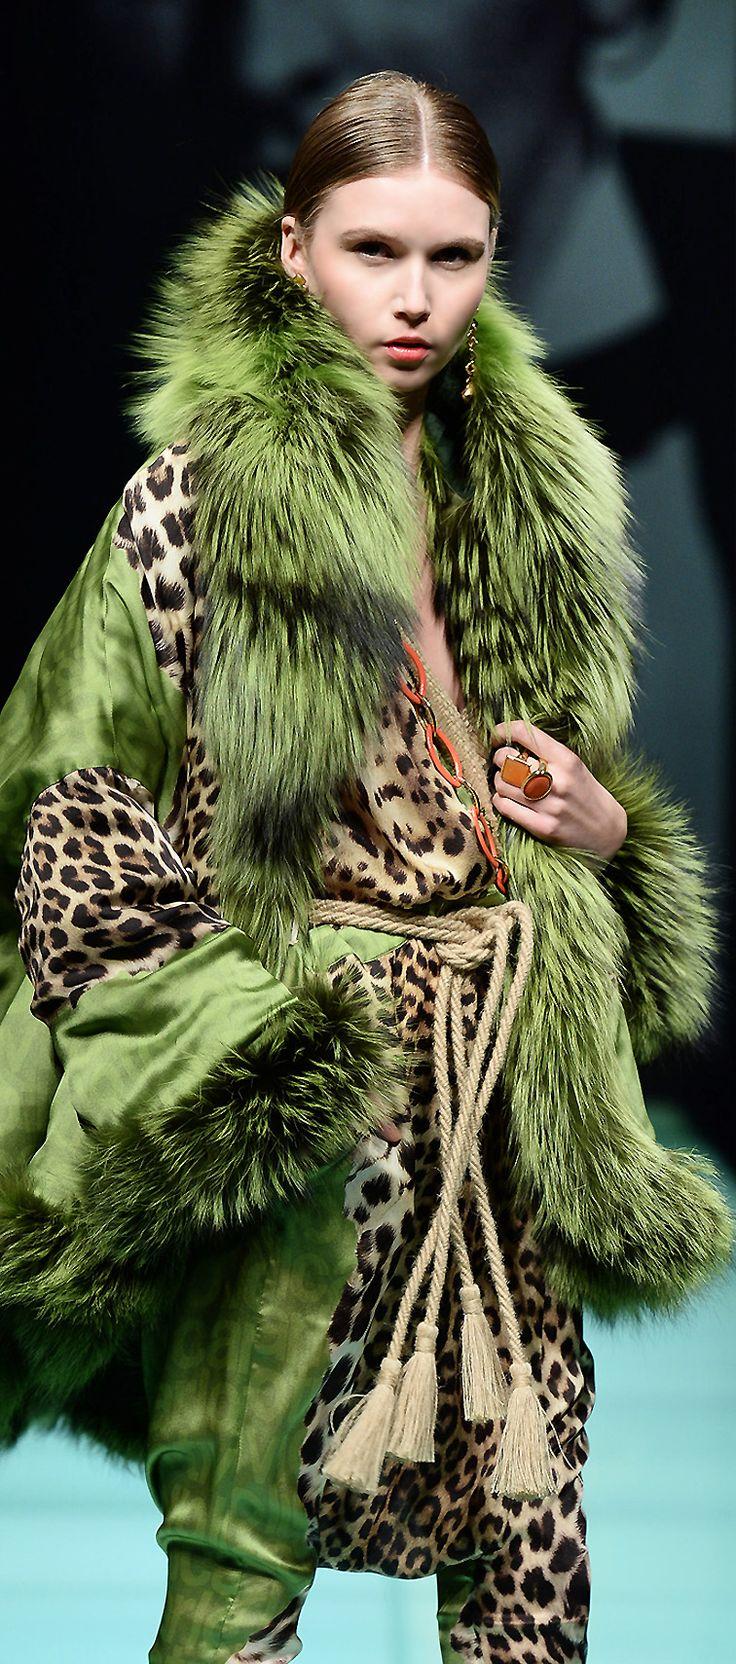 Carlo Tivioli leopard print & green fur coat Jacket animalistic fashion #UNIQUE_WOMENS_FASHION